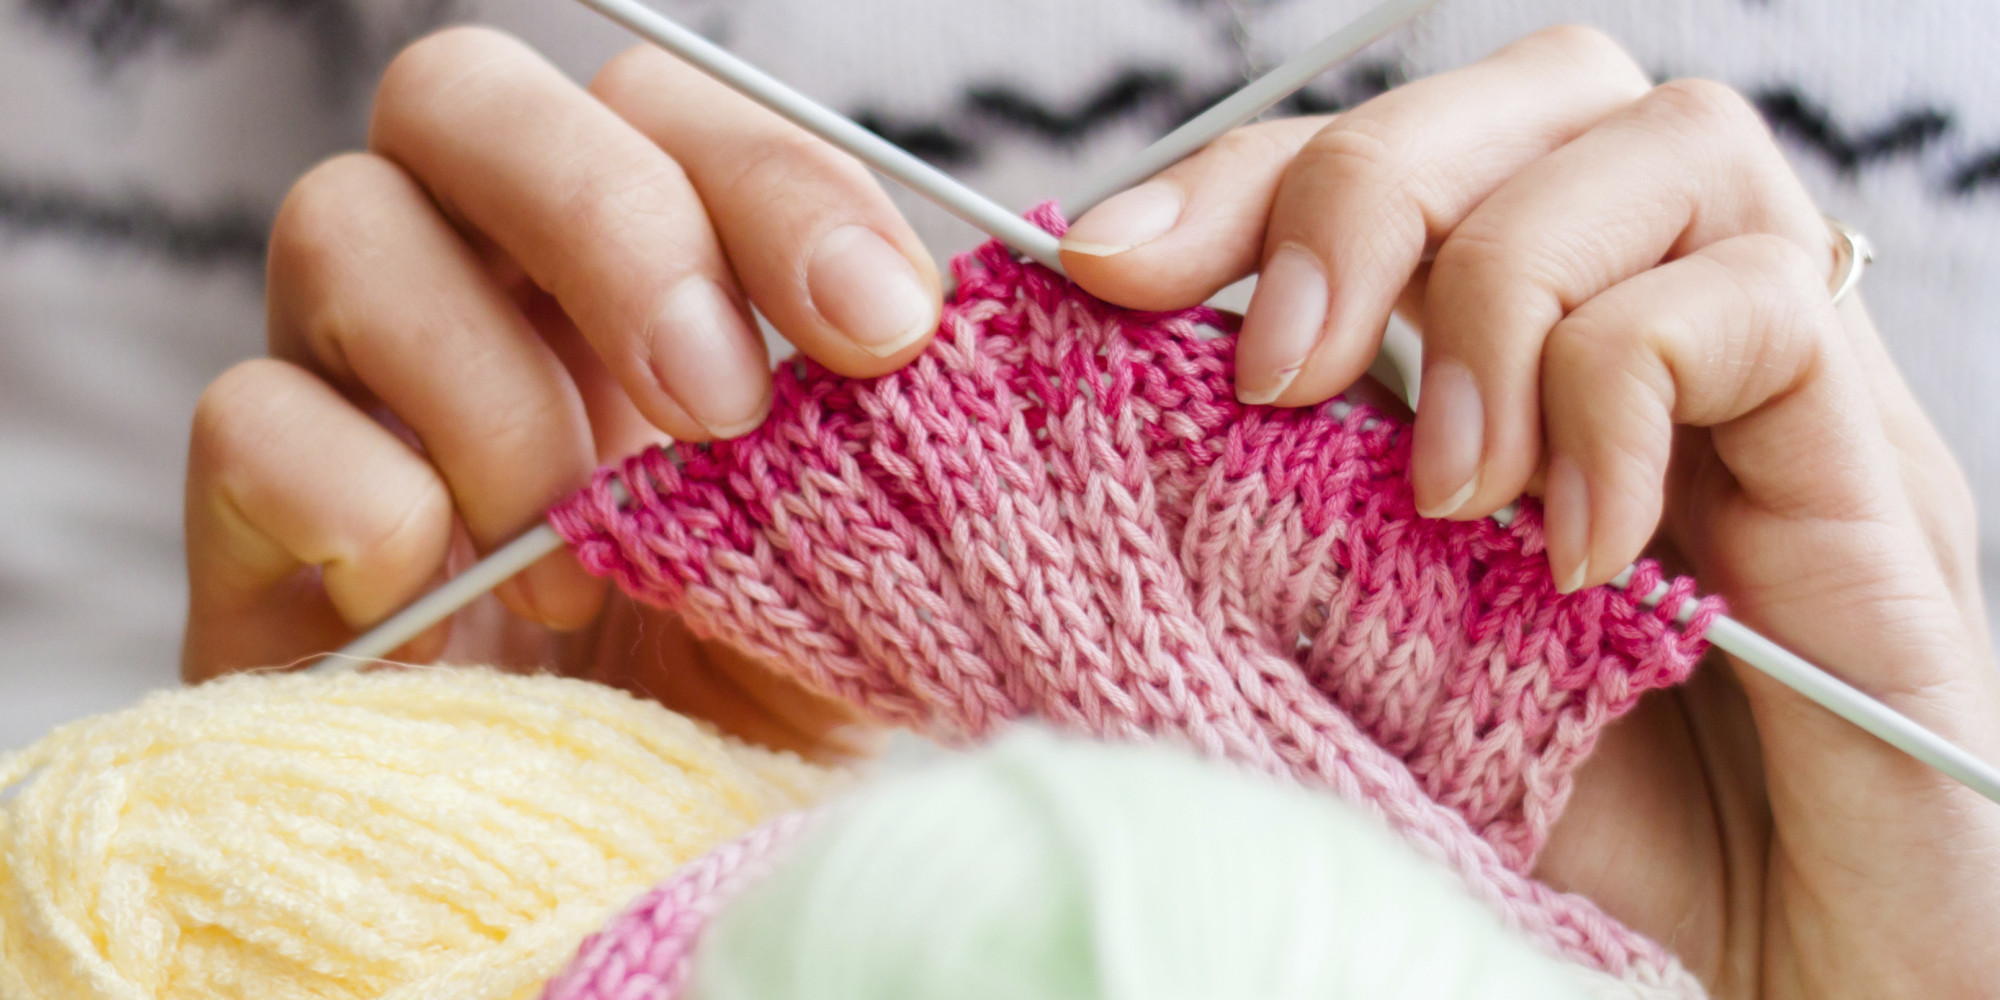 Senior Knitting, Shark Tank And Social Ties | HuffPost